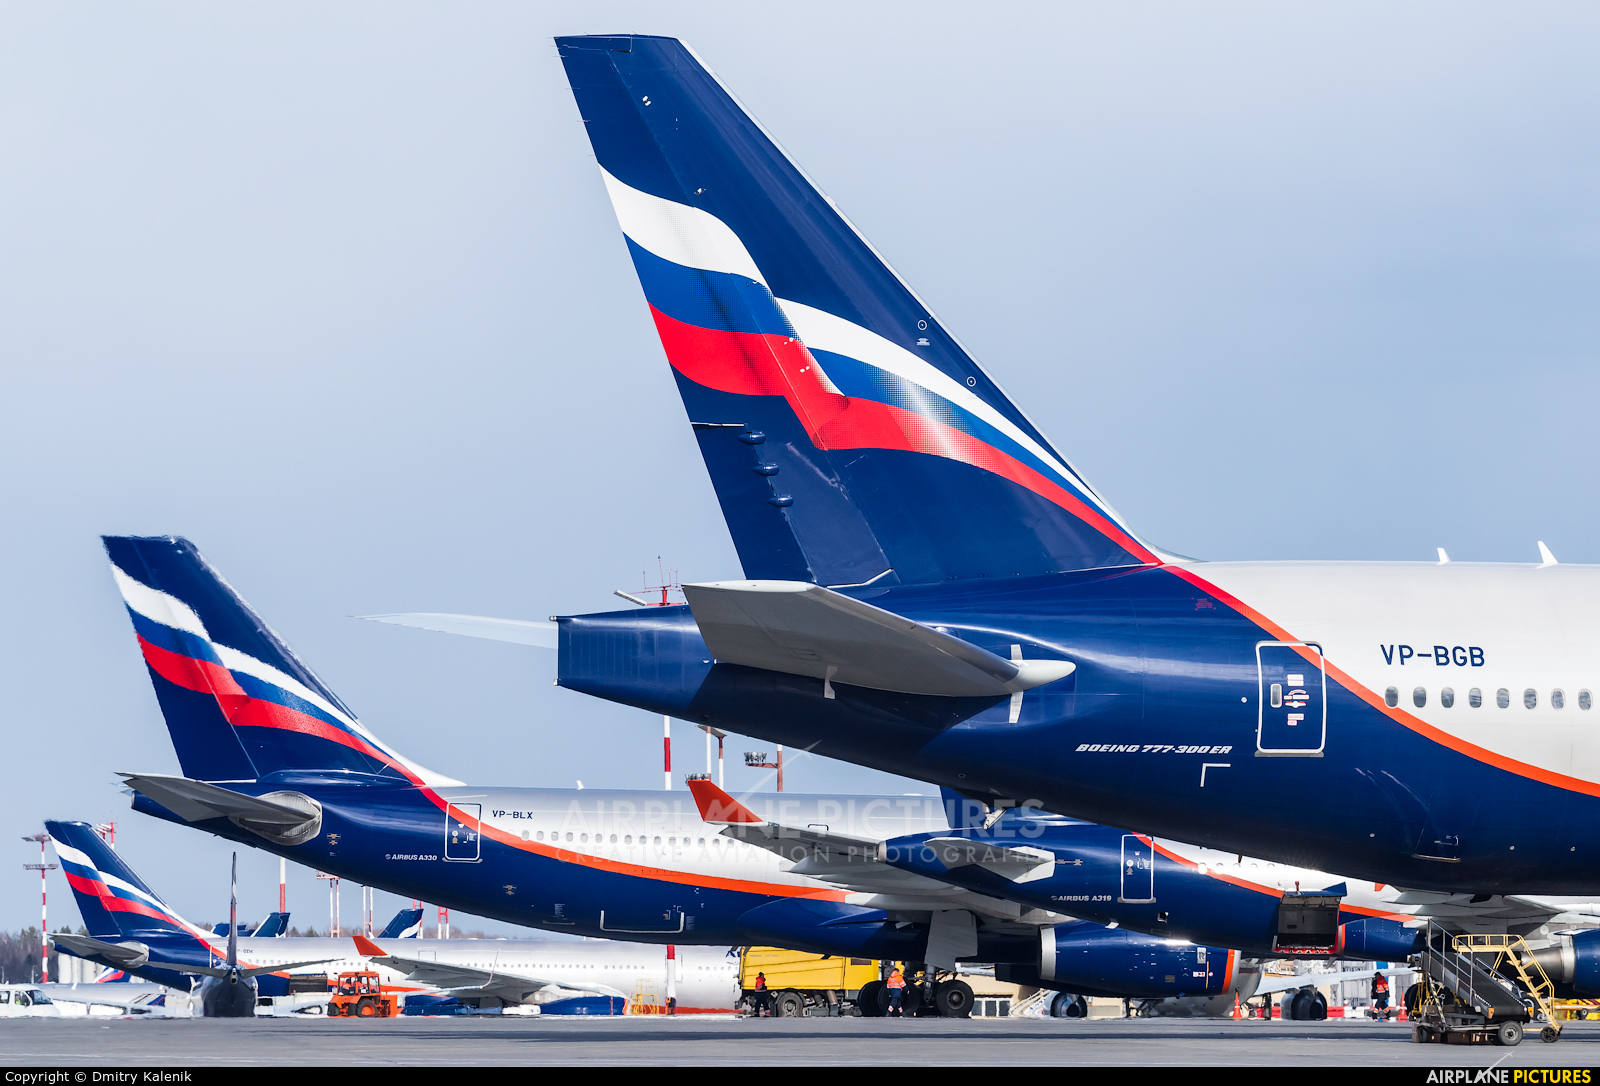 Aeroflot VP-BGB aircraft at Moscow - Sheremetyevo